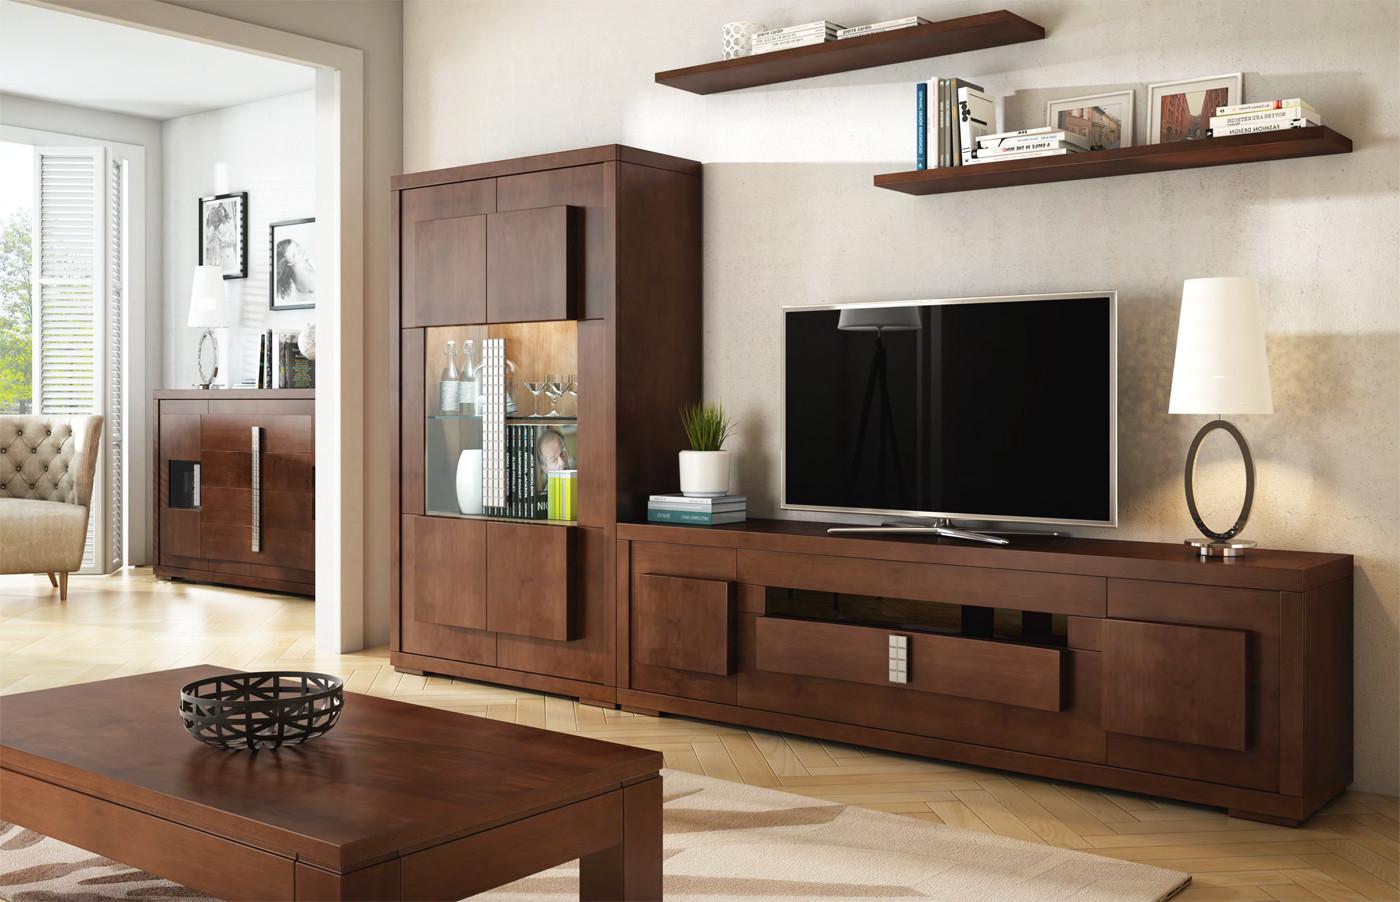 Mobiliario Salon Zwdg Mueble De Diseà O Con Iluminacià N Led Para Salones Y Edores Modernos